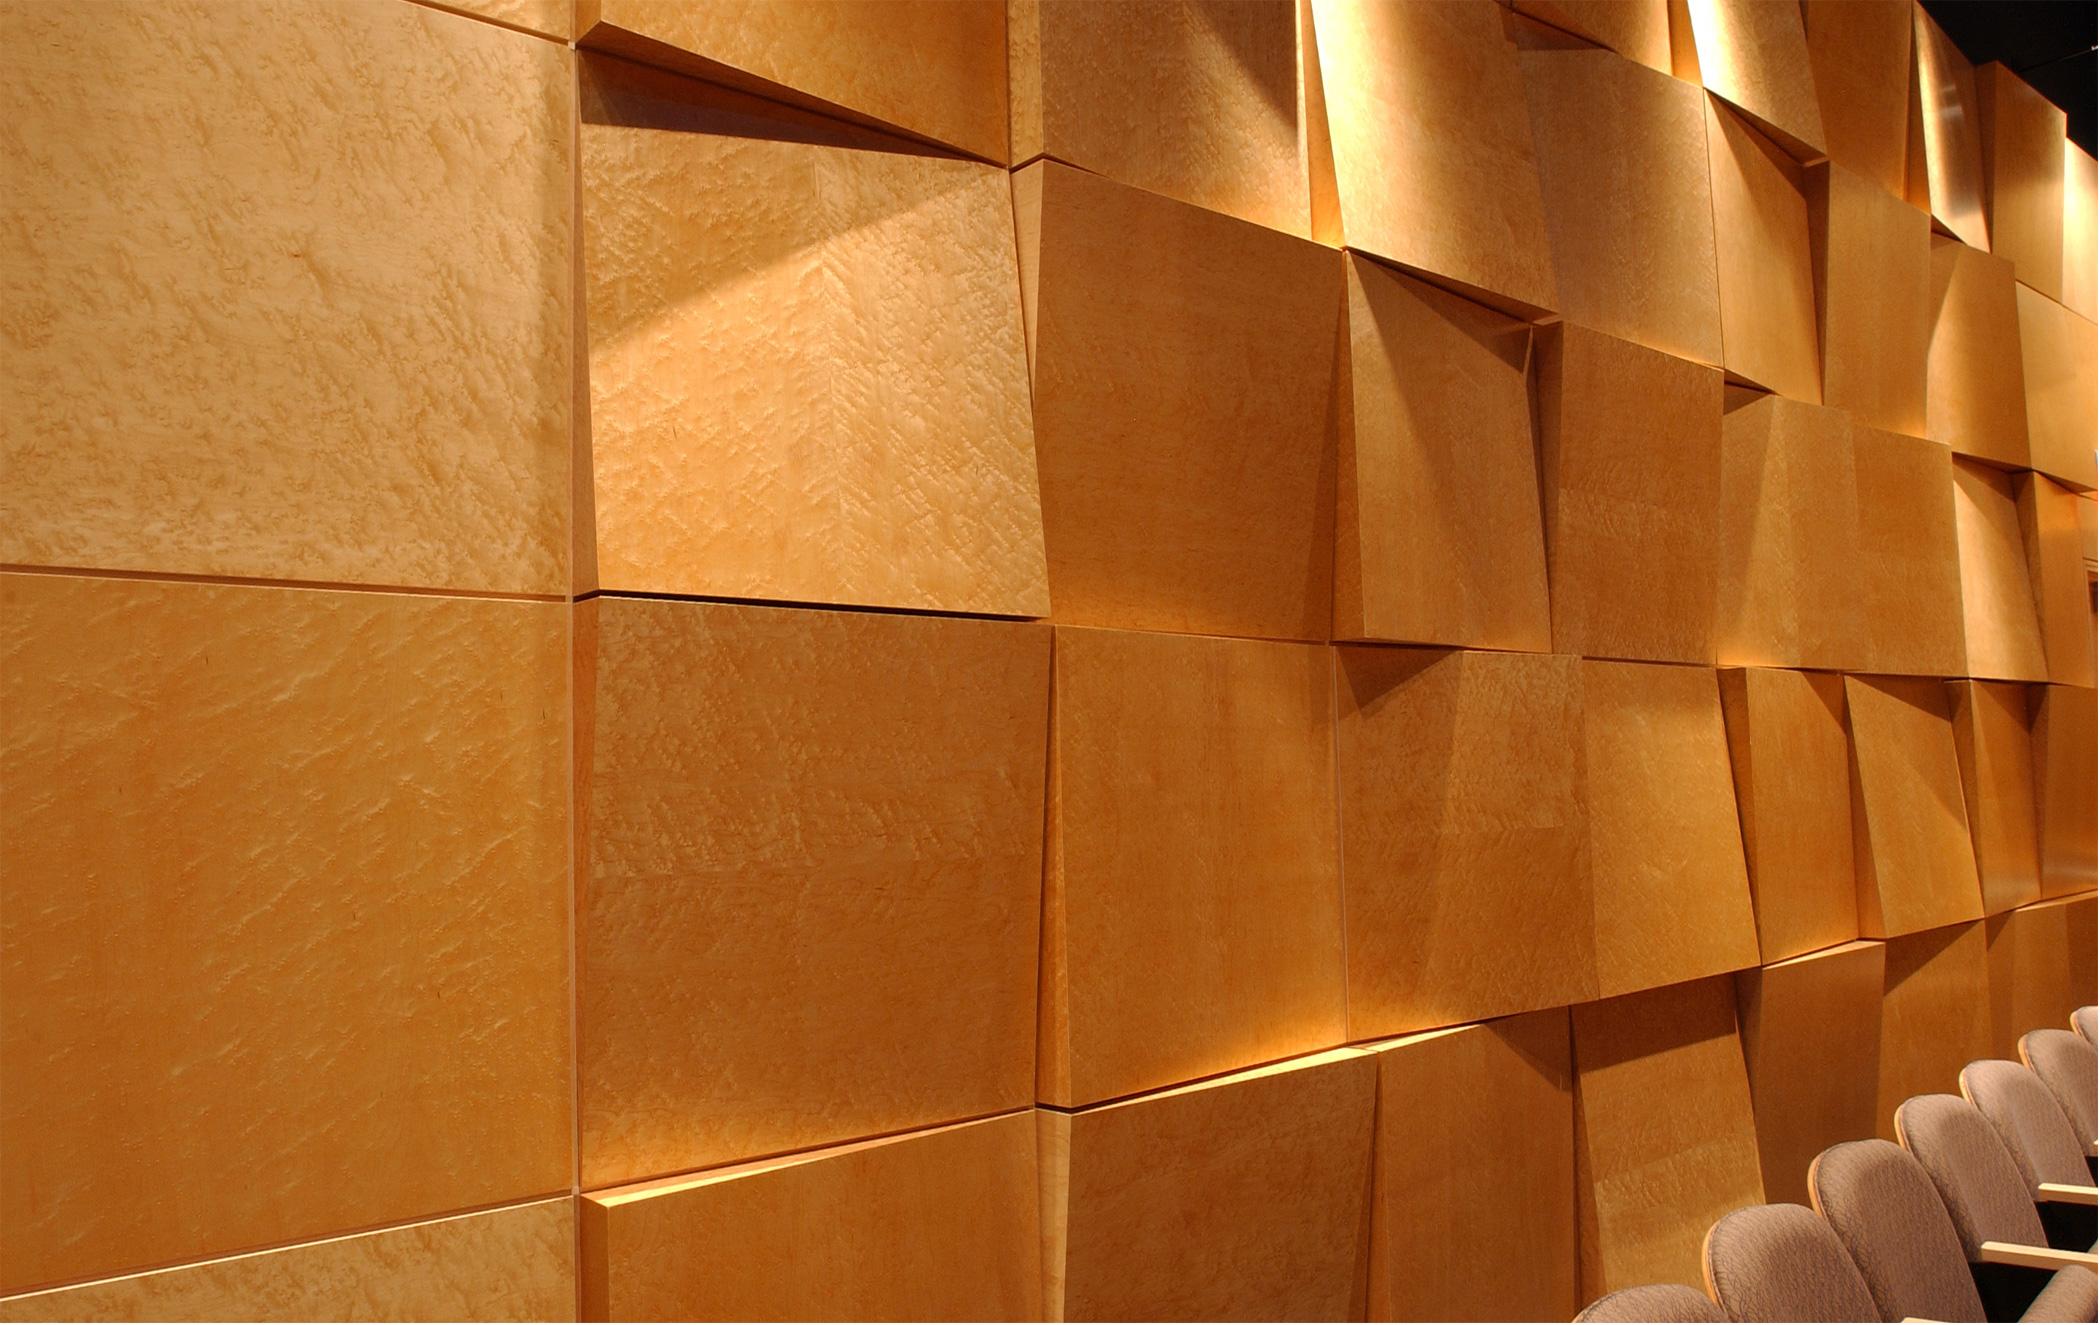 Sanply-maple-be-fla-memorial-college-wall-cuh_8009900074_o